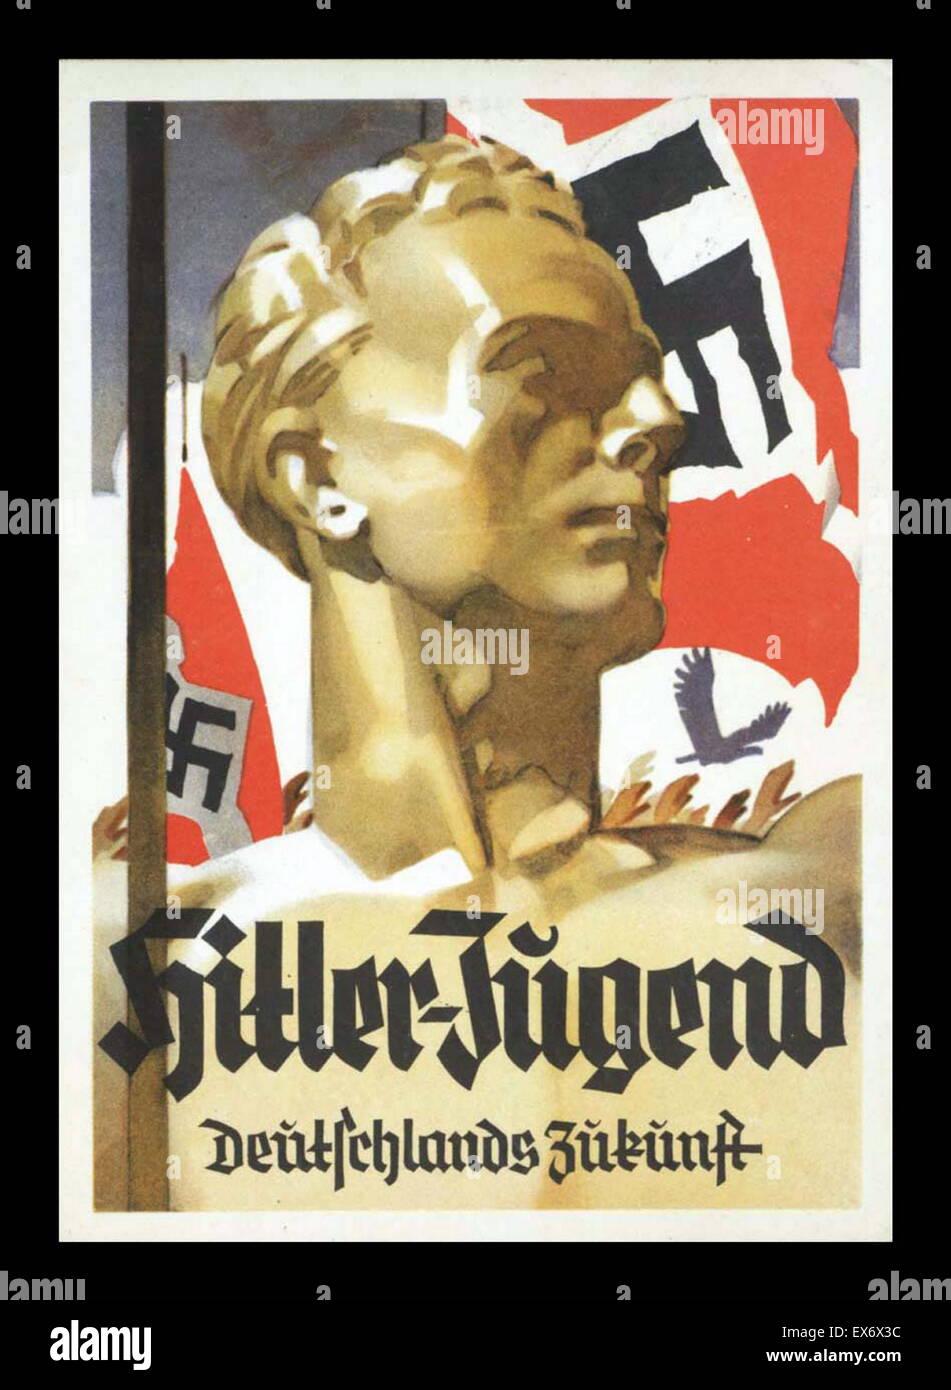 Hitler Youth Nazi propaganda recruitment poster 1942 - Stock Image